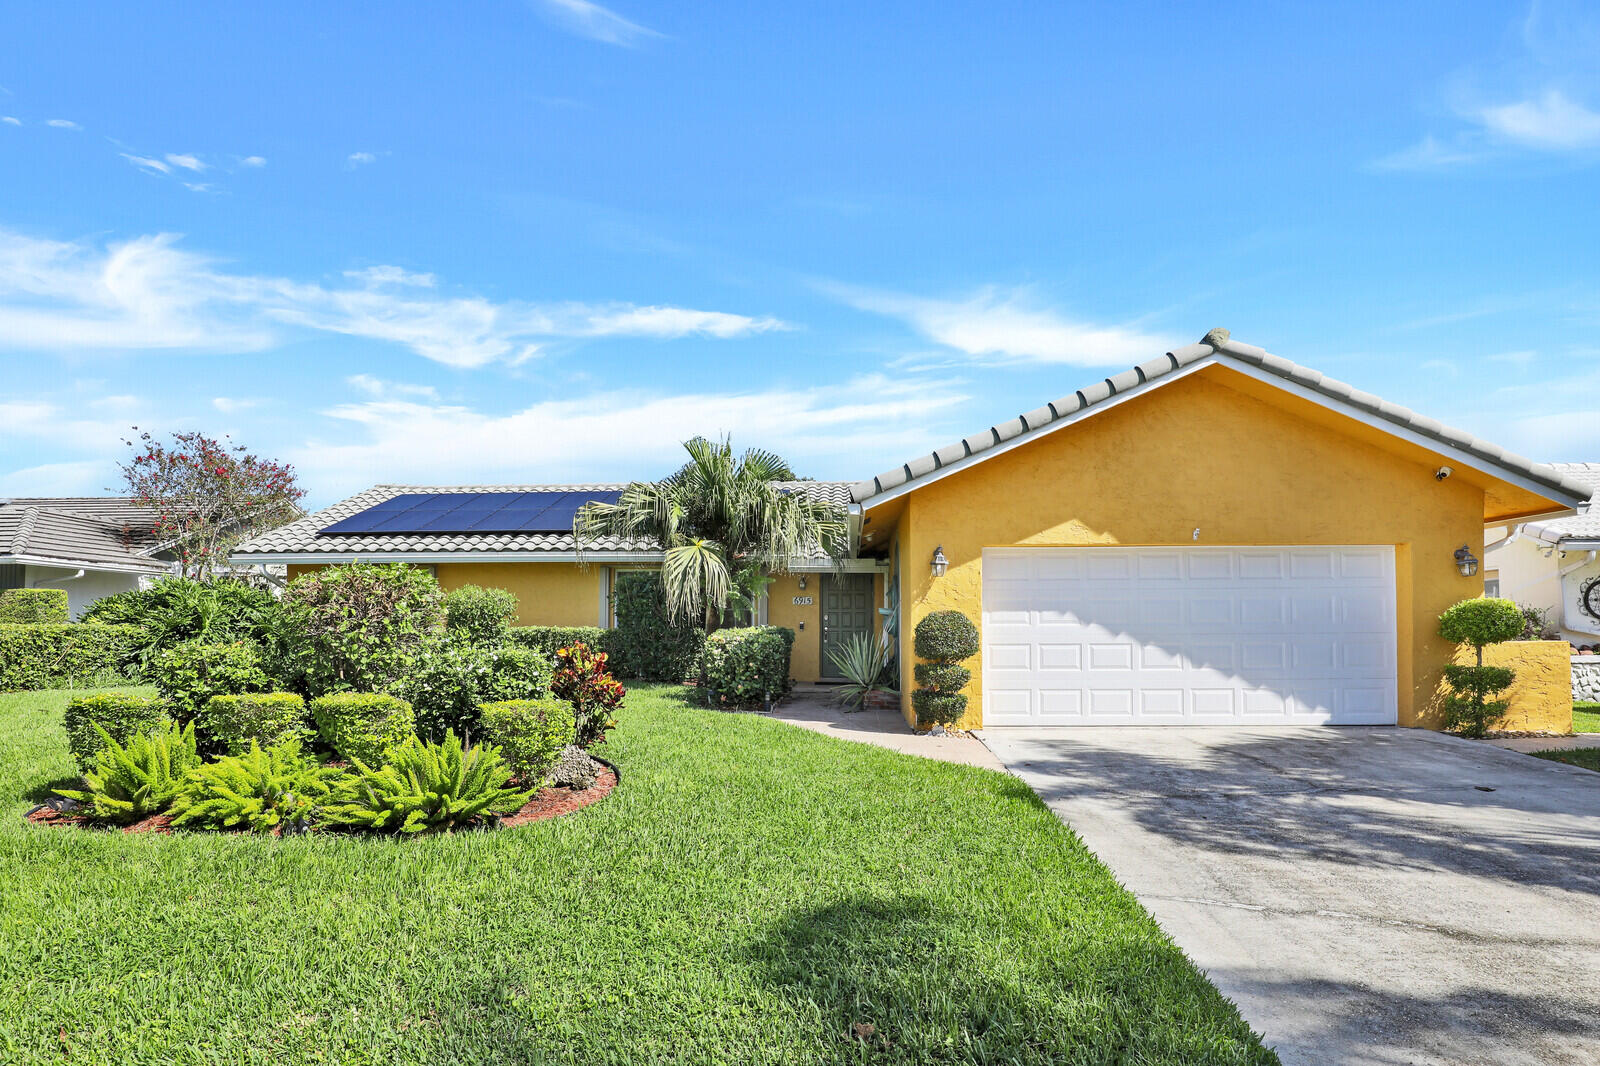 6915 N Calle Del Paz N, Boca Raton, FL 33433